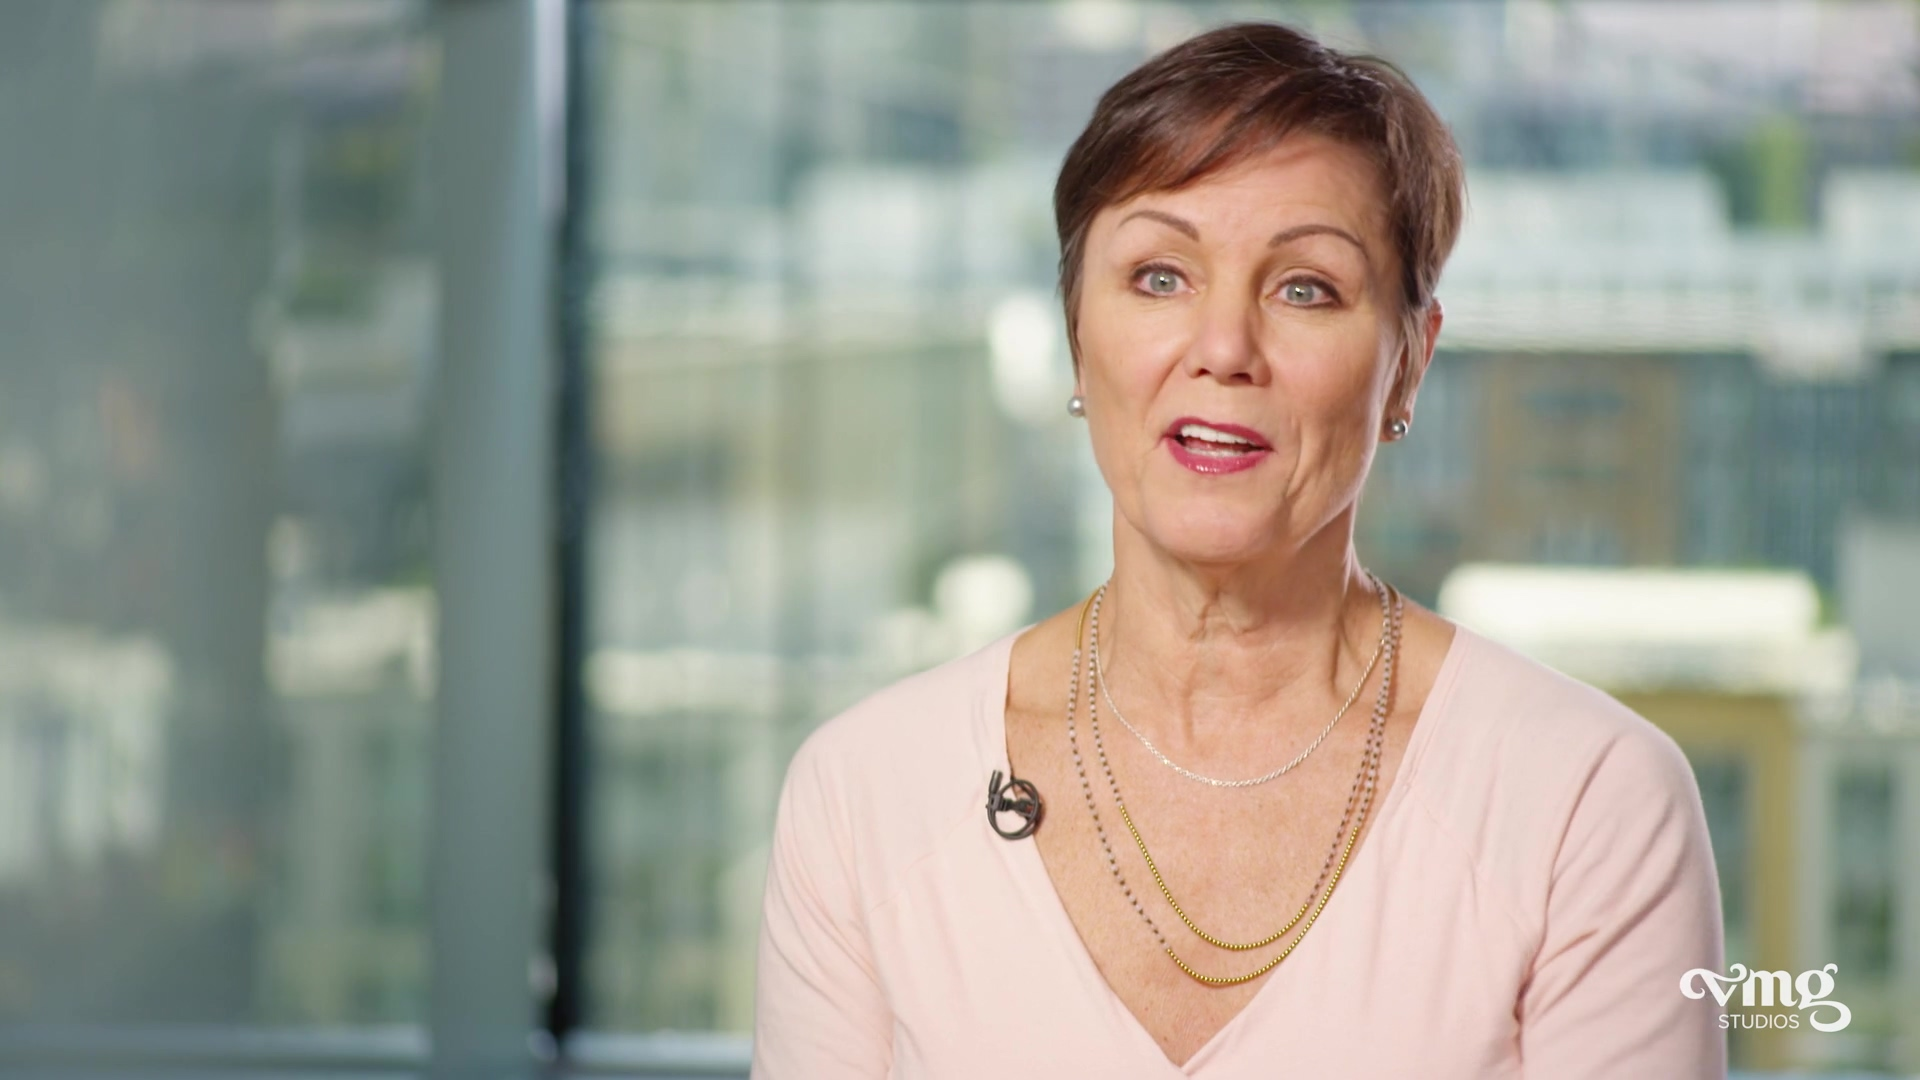 Amazon-Maureen-Midgley-Authentic-business-messaging-VMG-Studios